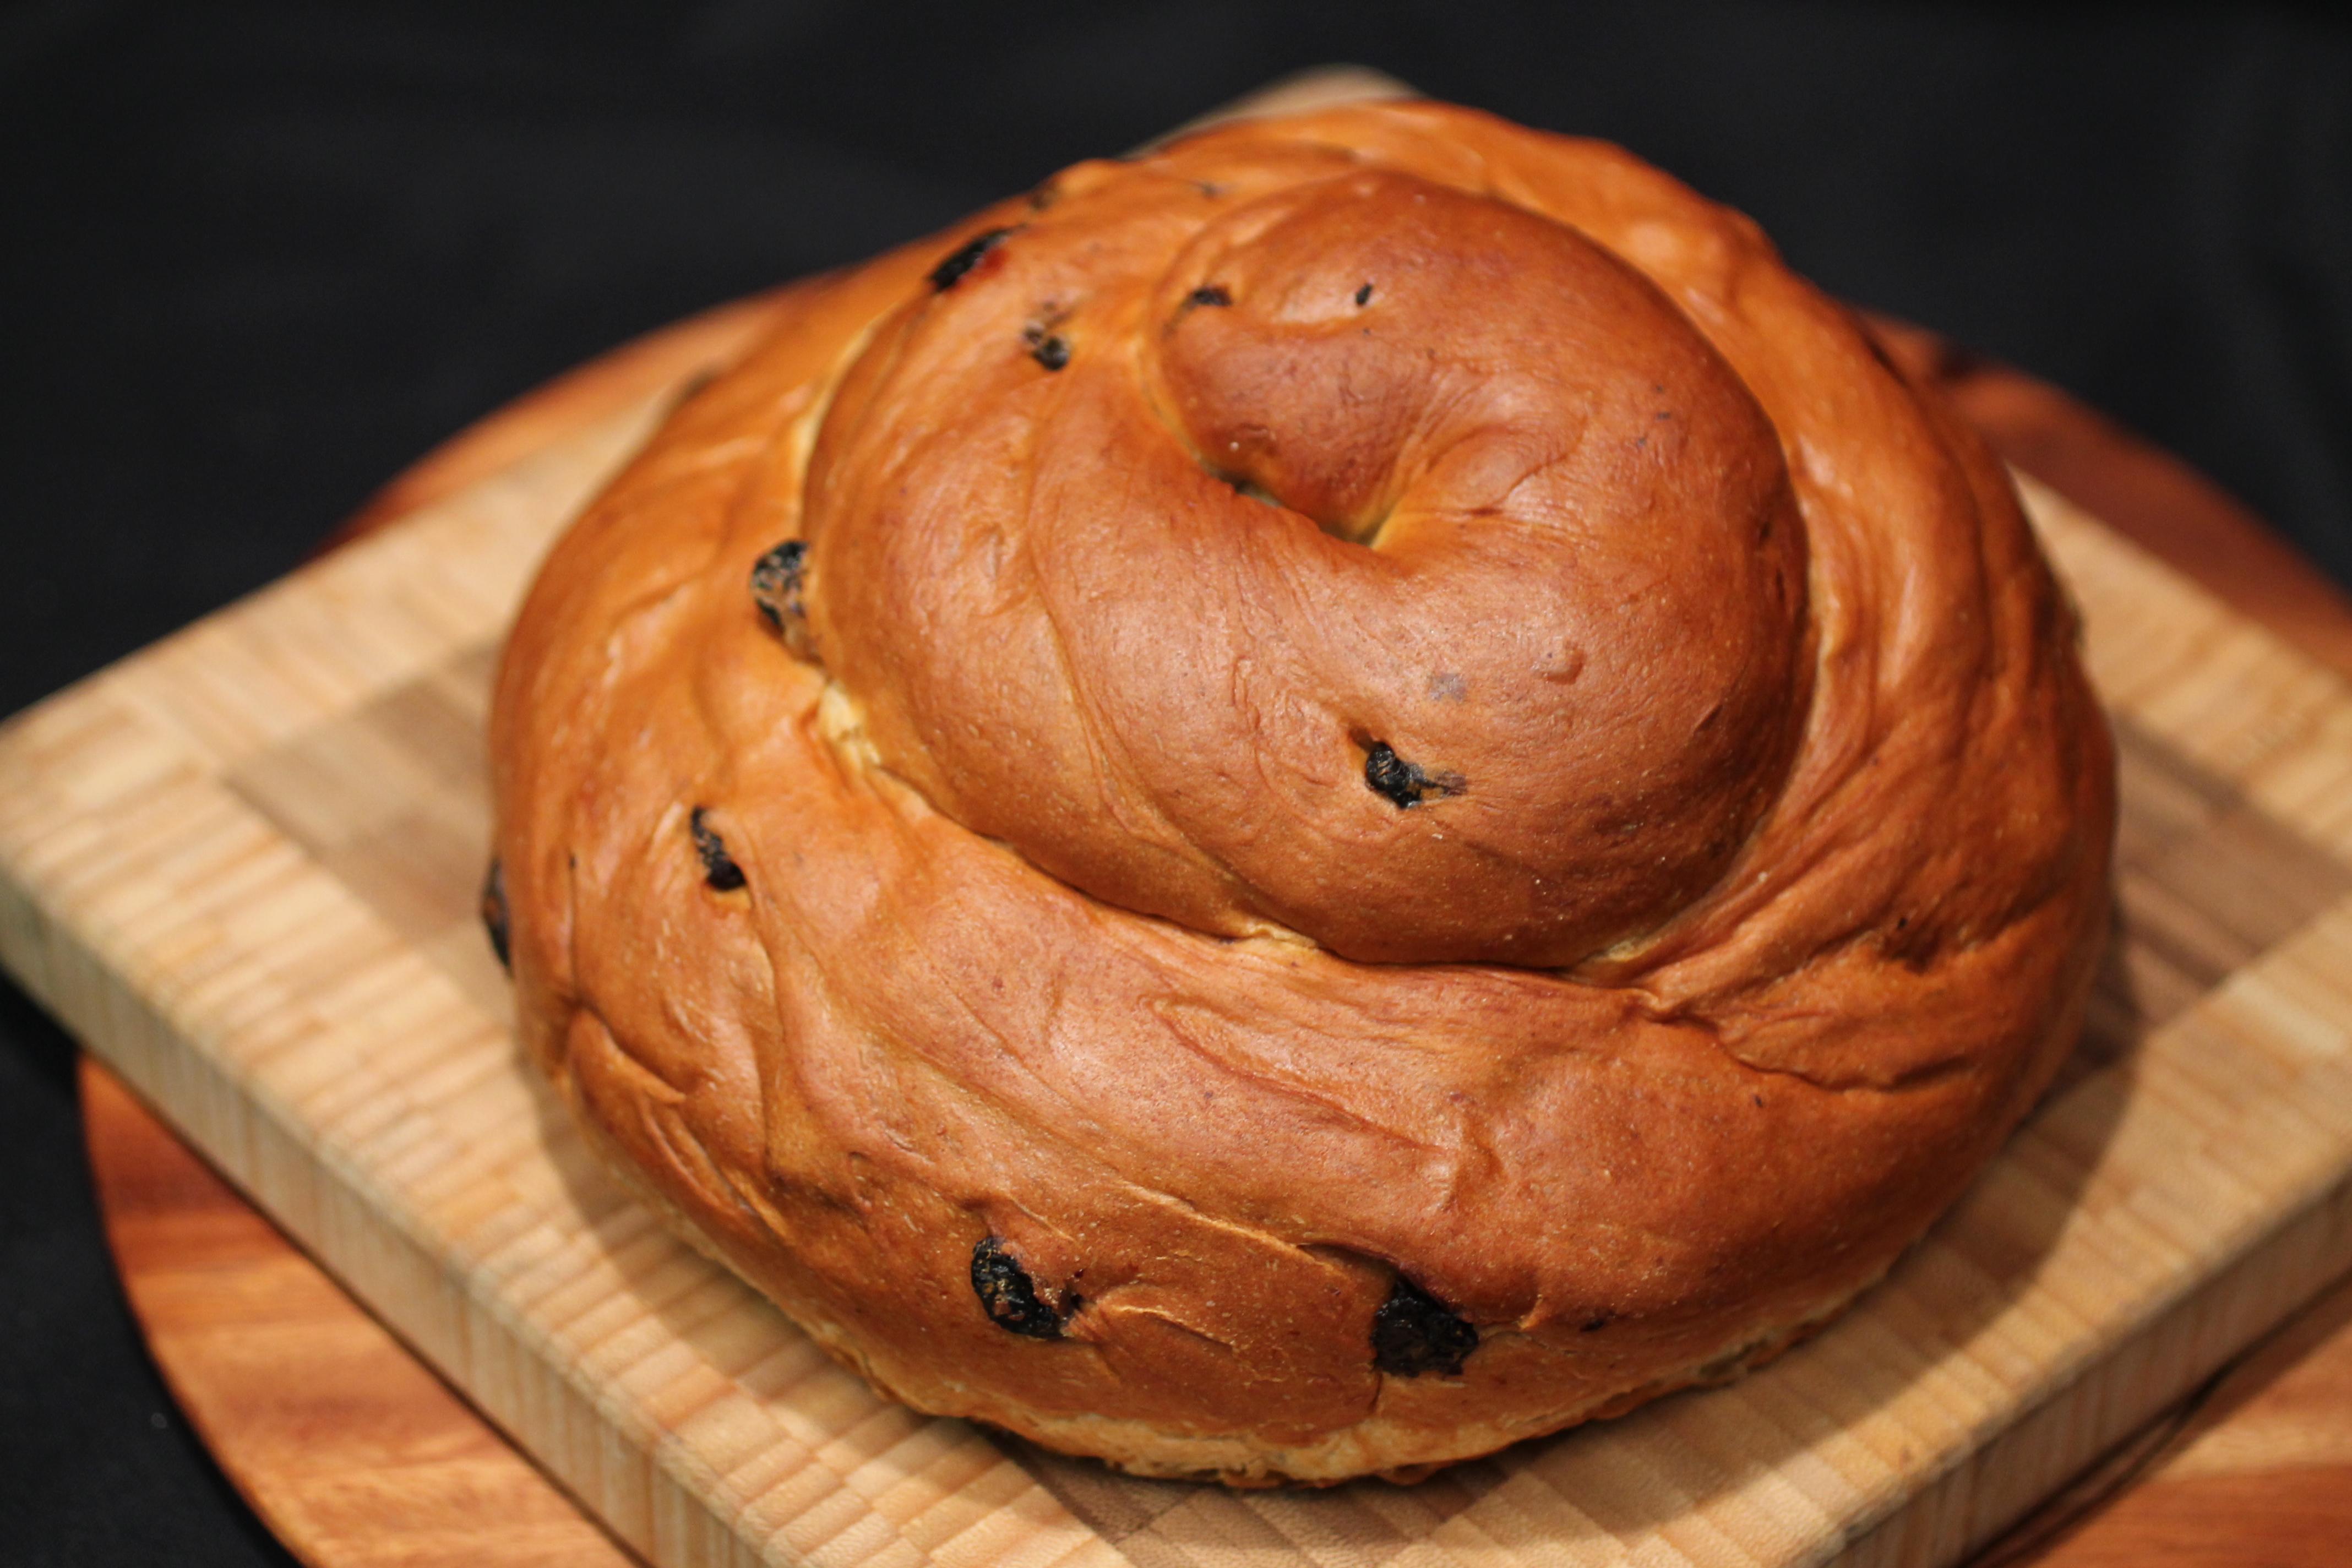 Challah bread with raisins for Rosh Hashanah